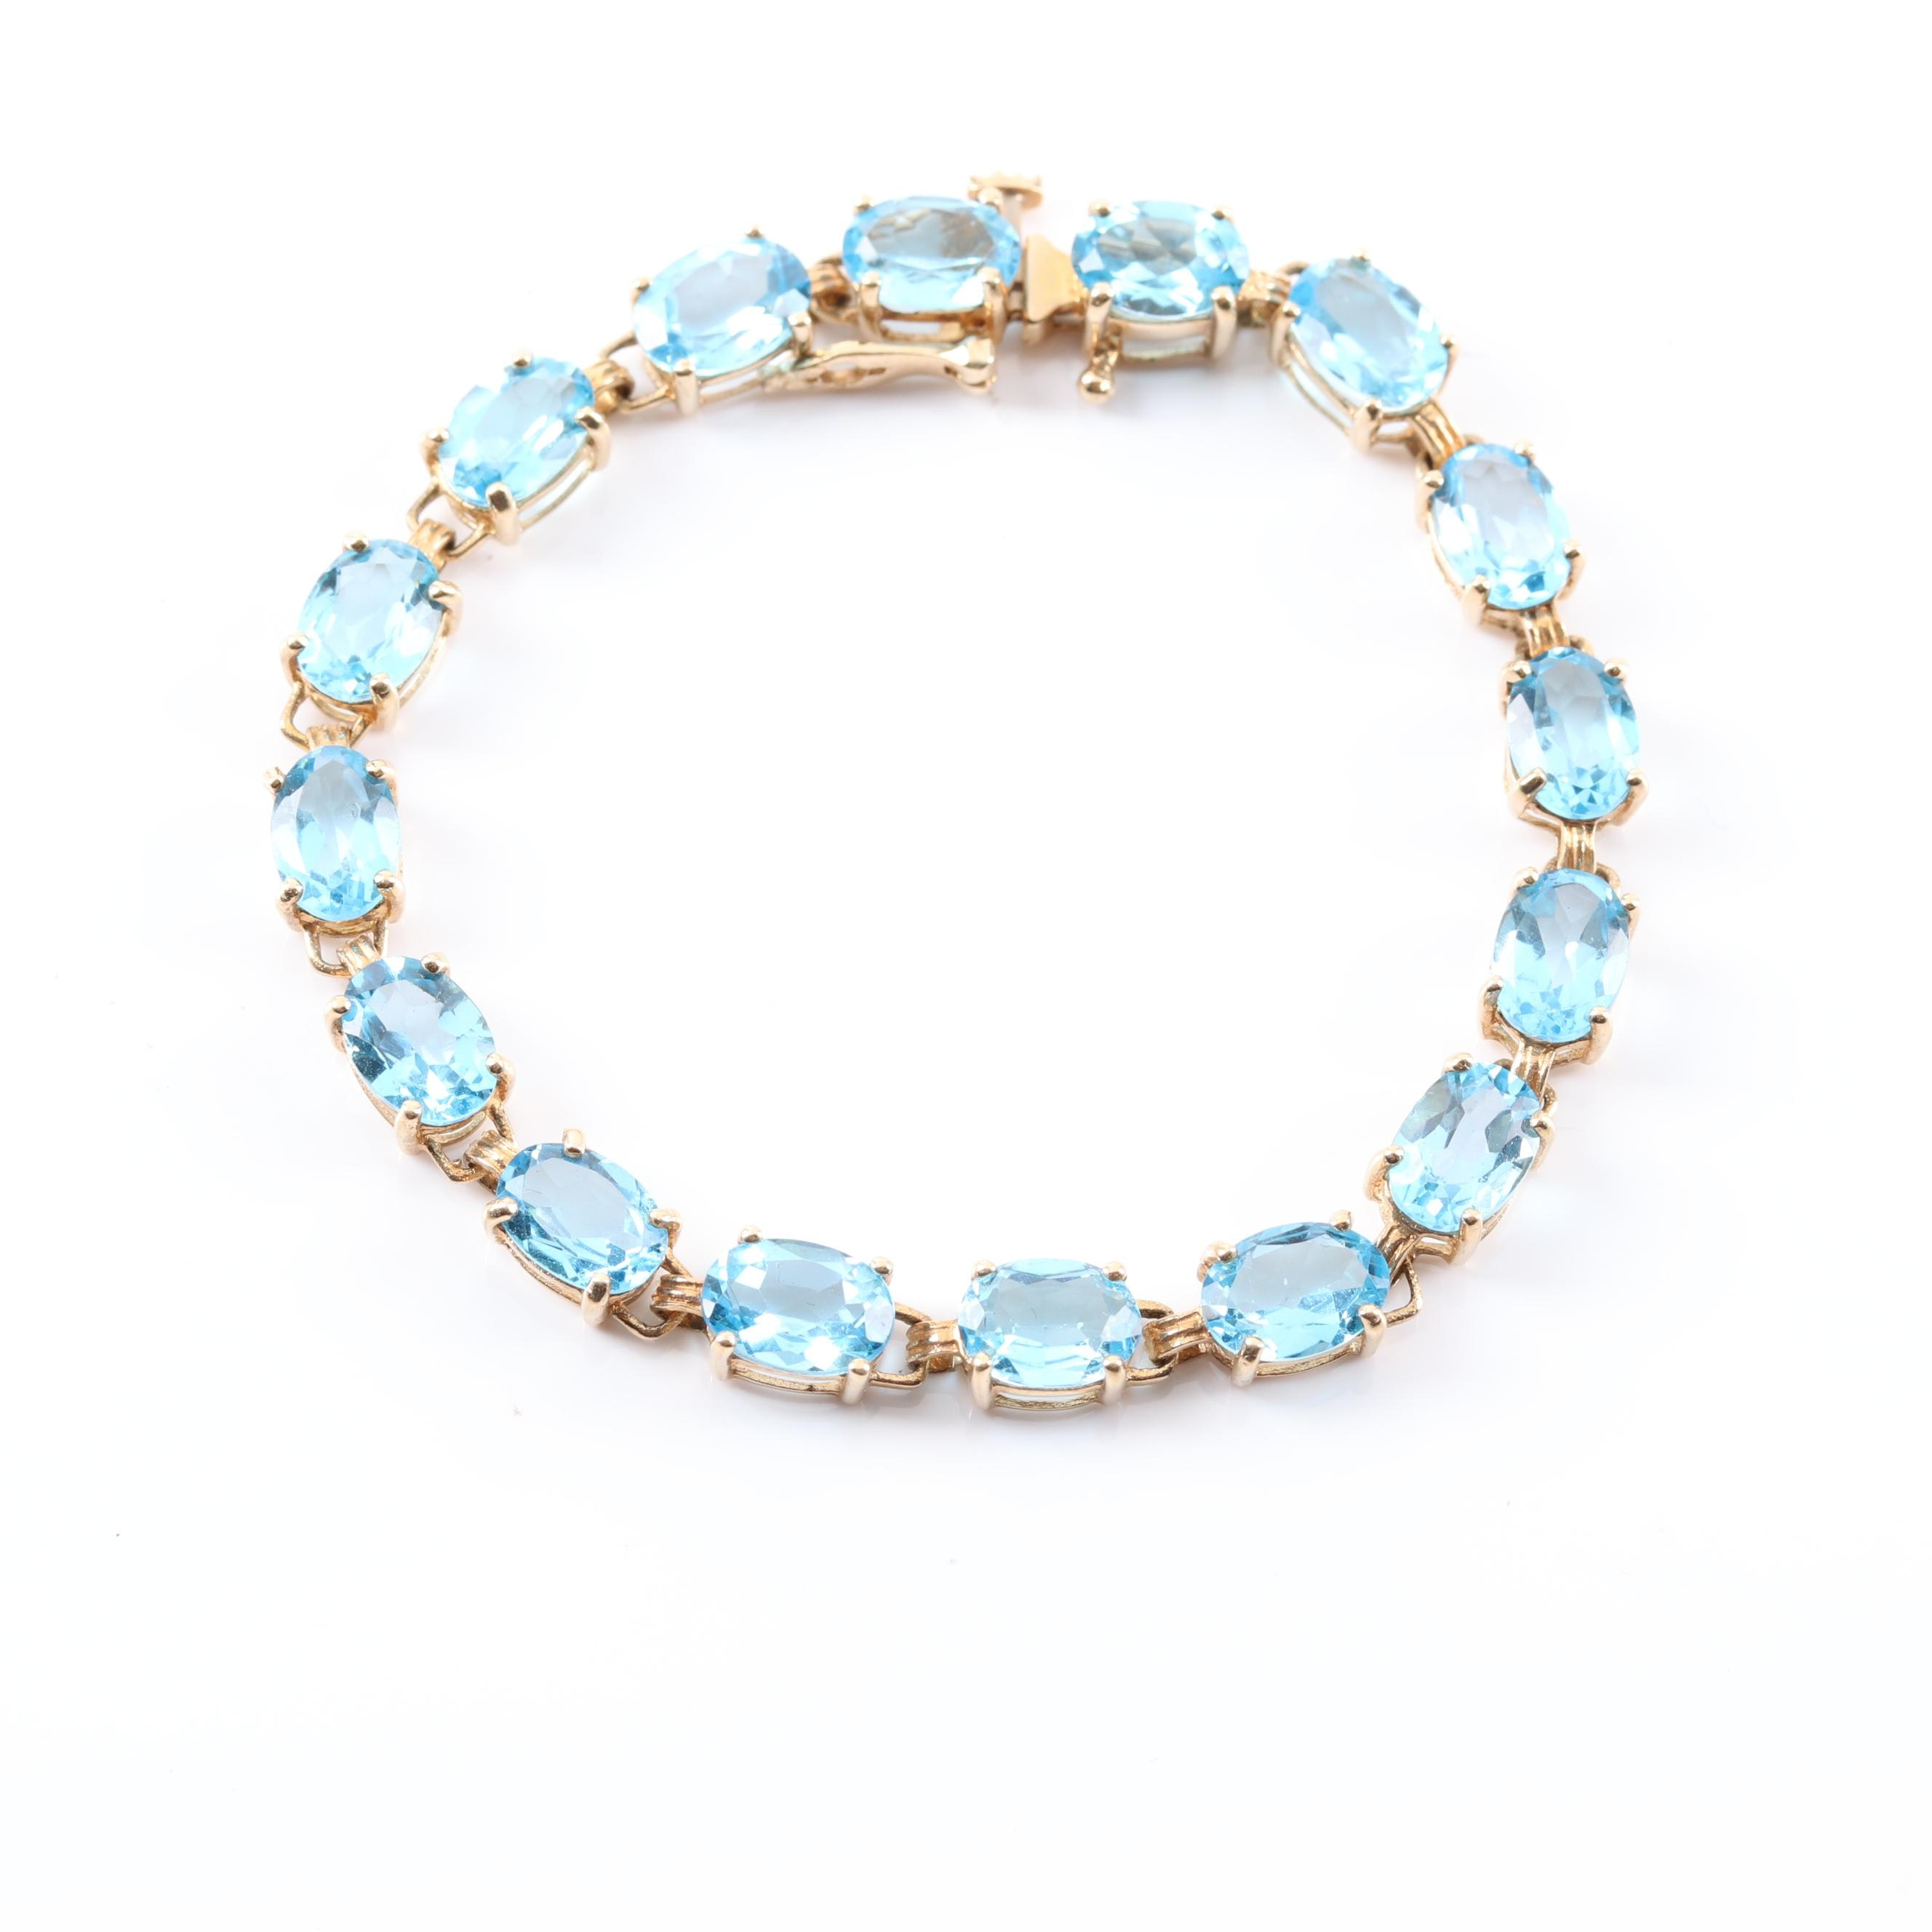 10K Yellow Gold 16.00 CTW Blue Topaz Bracelet